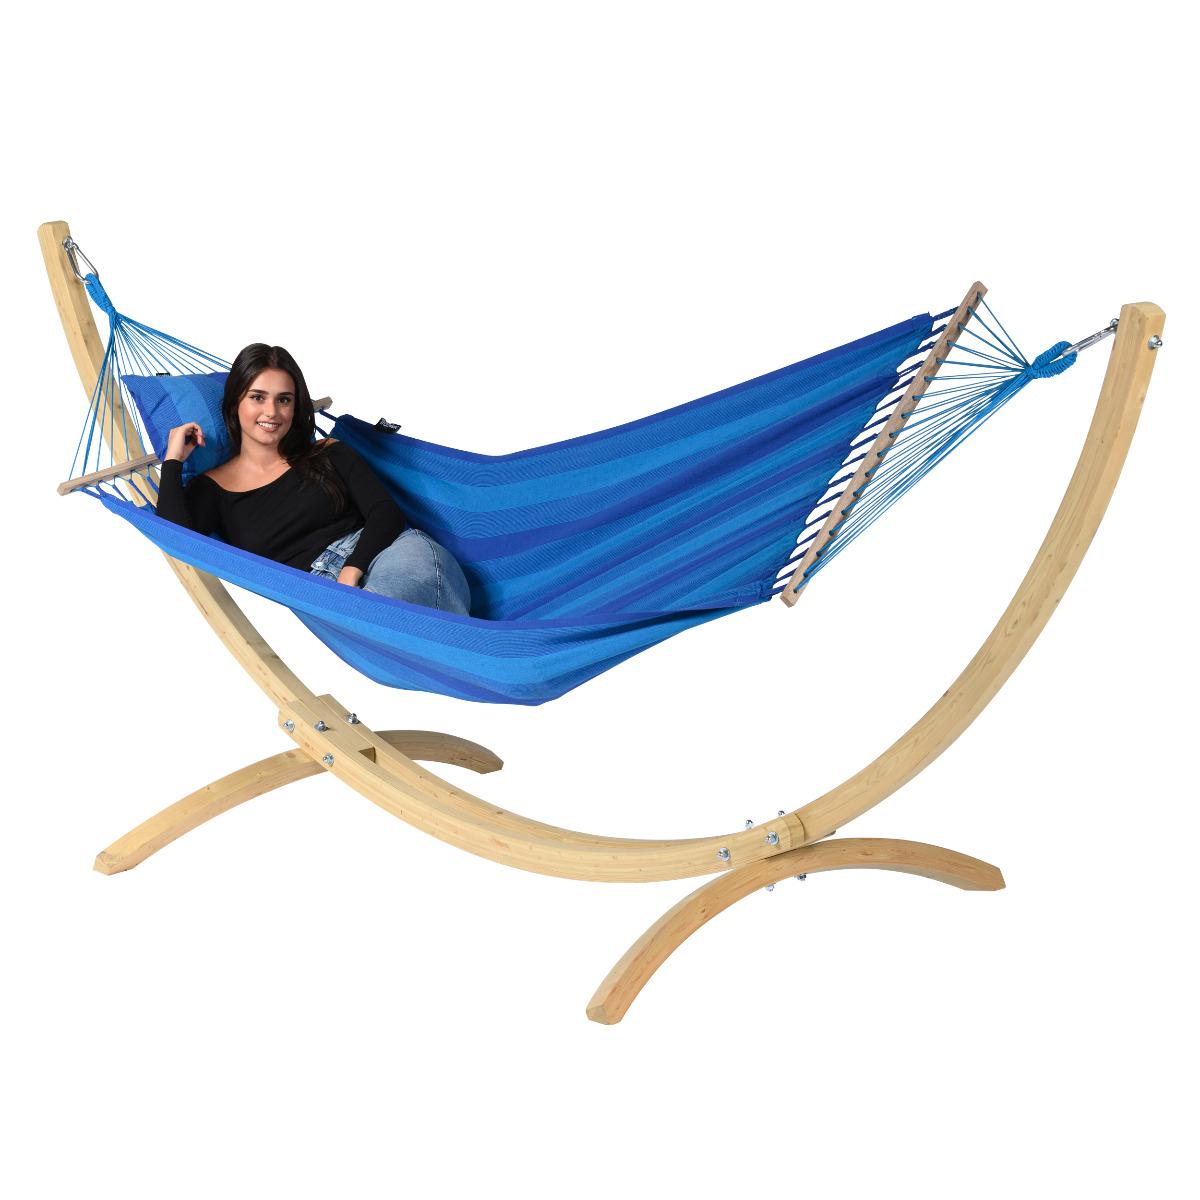 Hangmatset Single 'Wood & Relax' Blue - Tropilex �